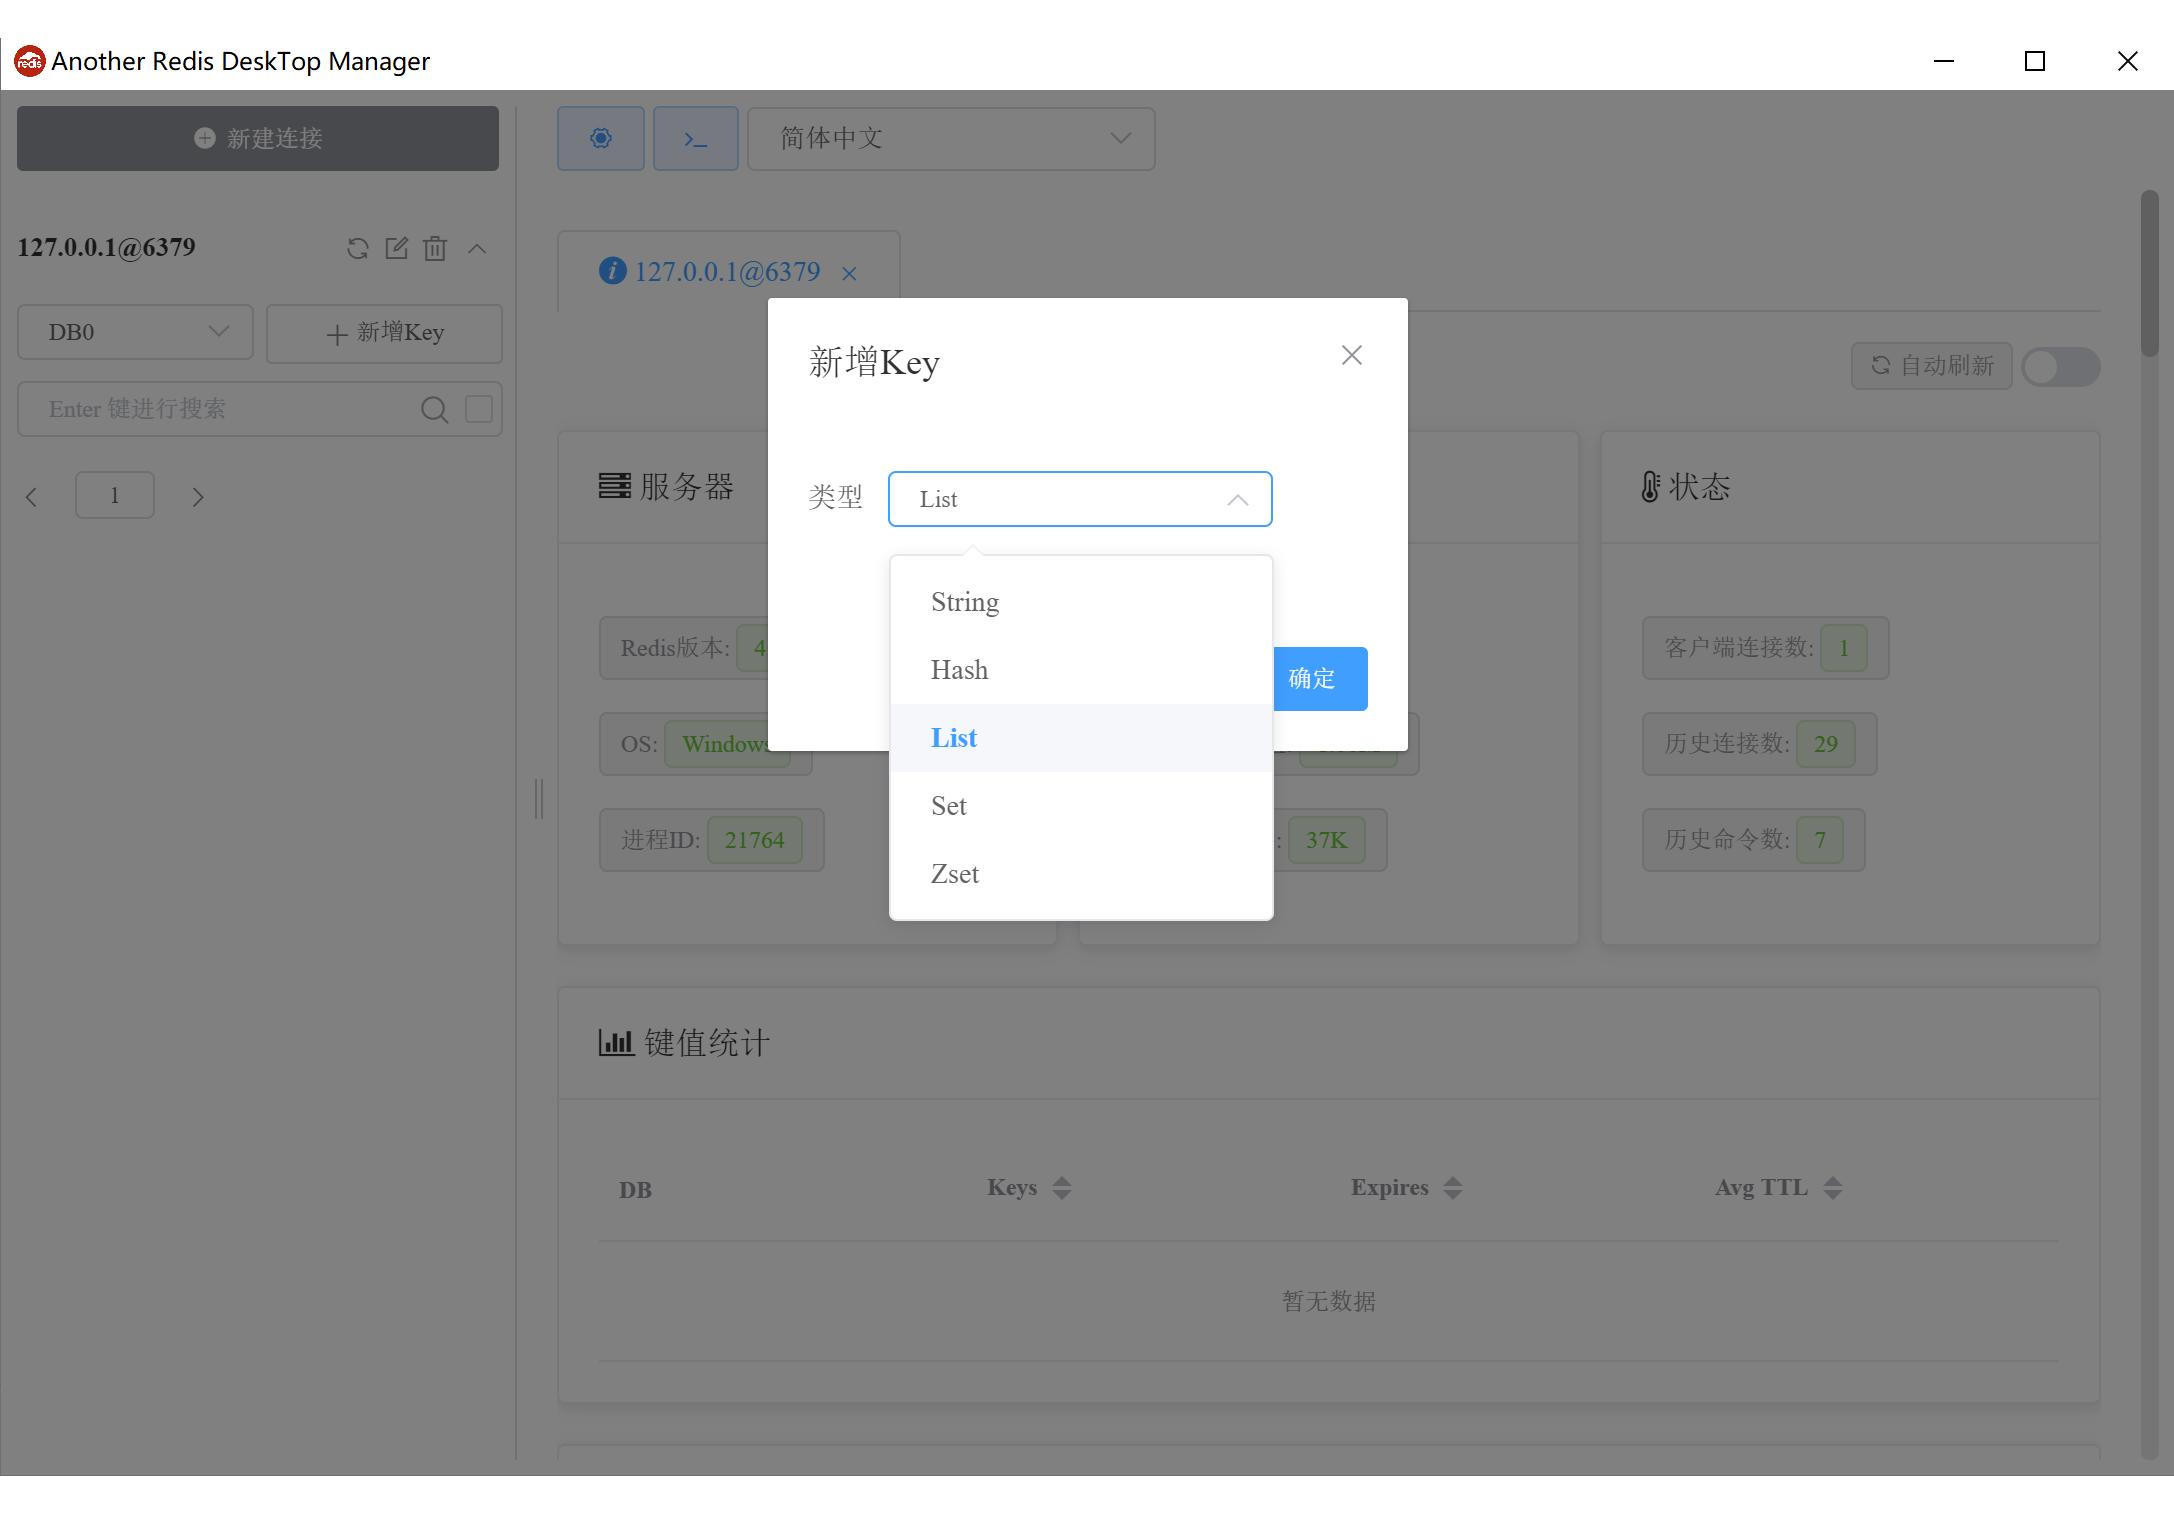 Redis 可视化客户端台湾快乐8优游平台工具